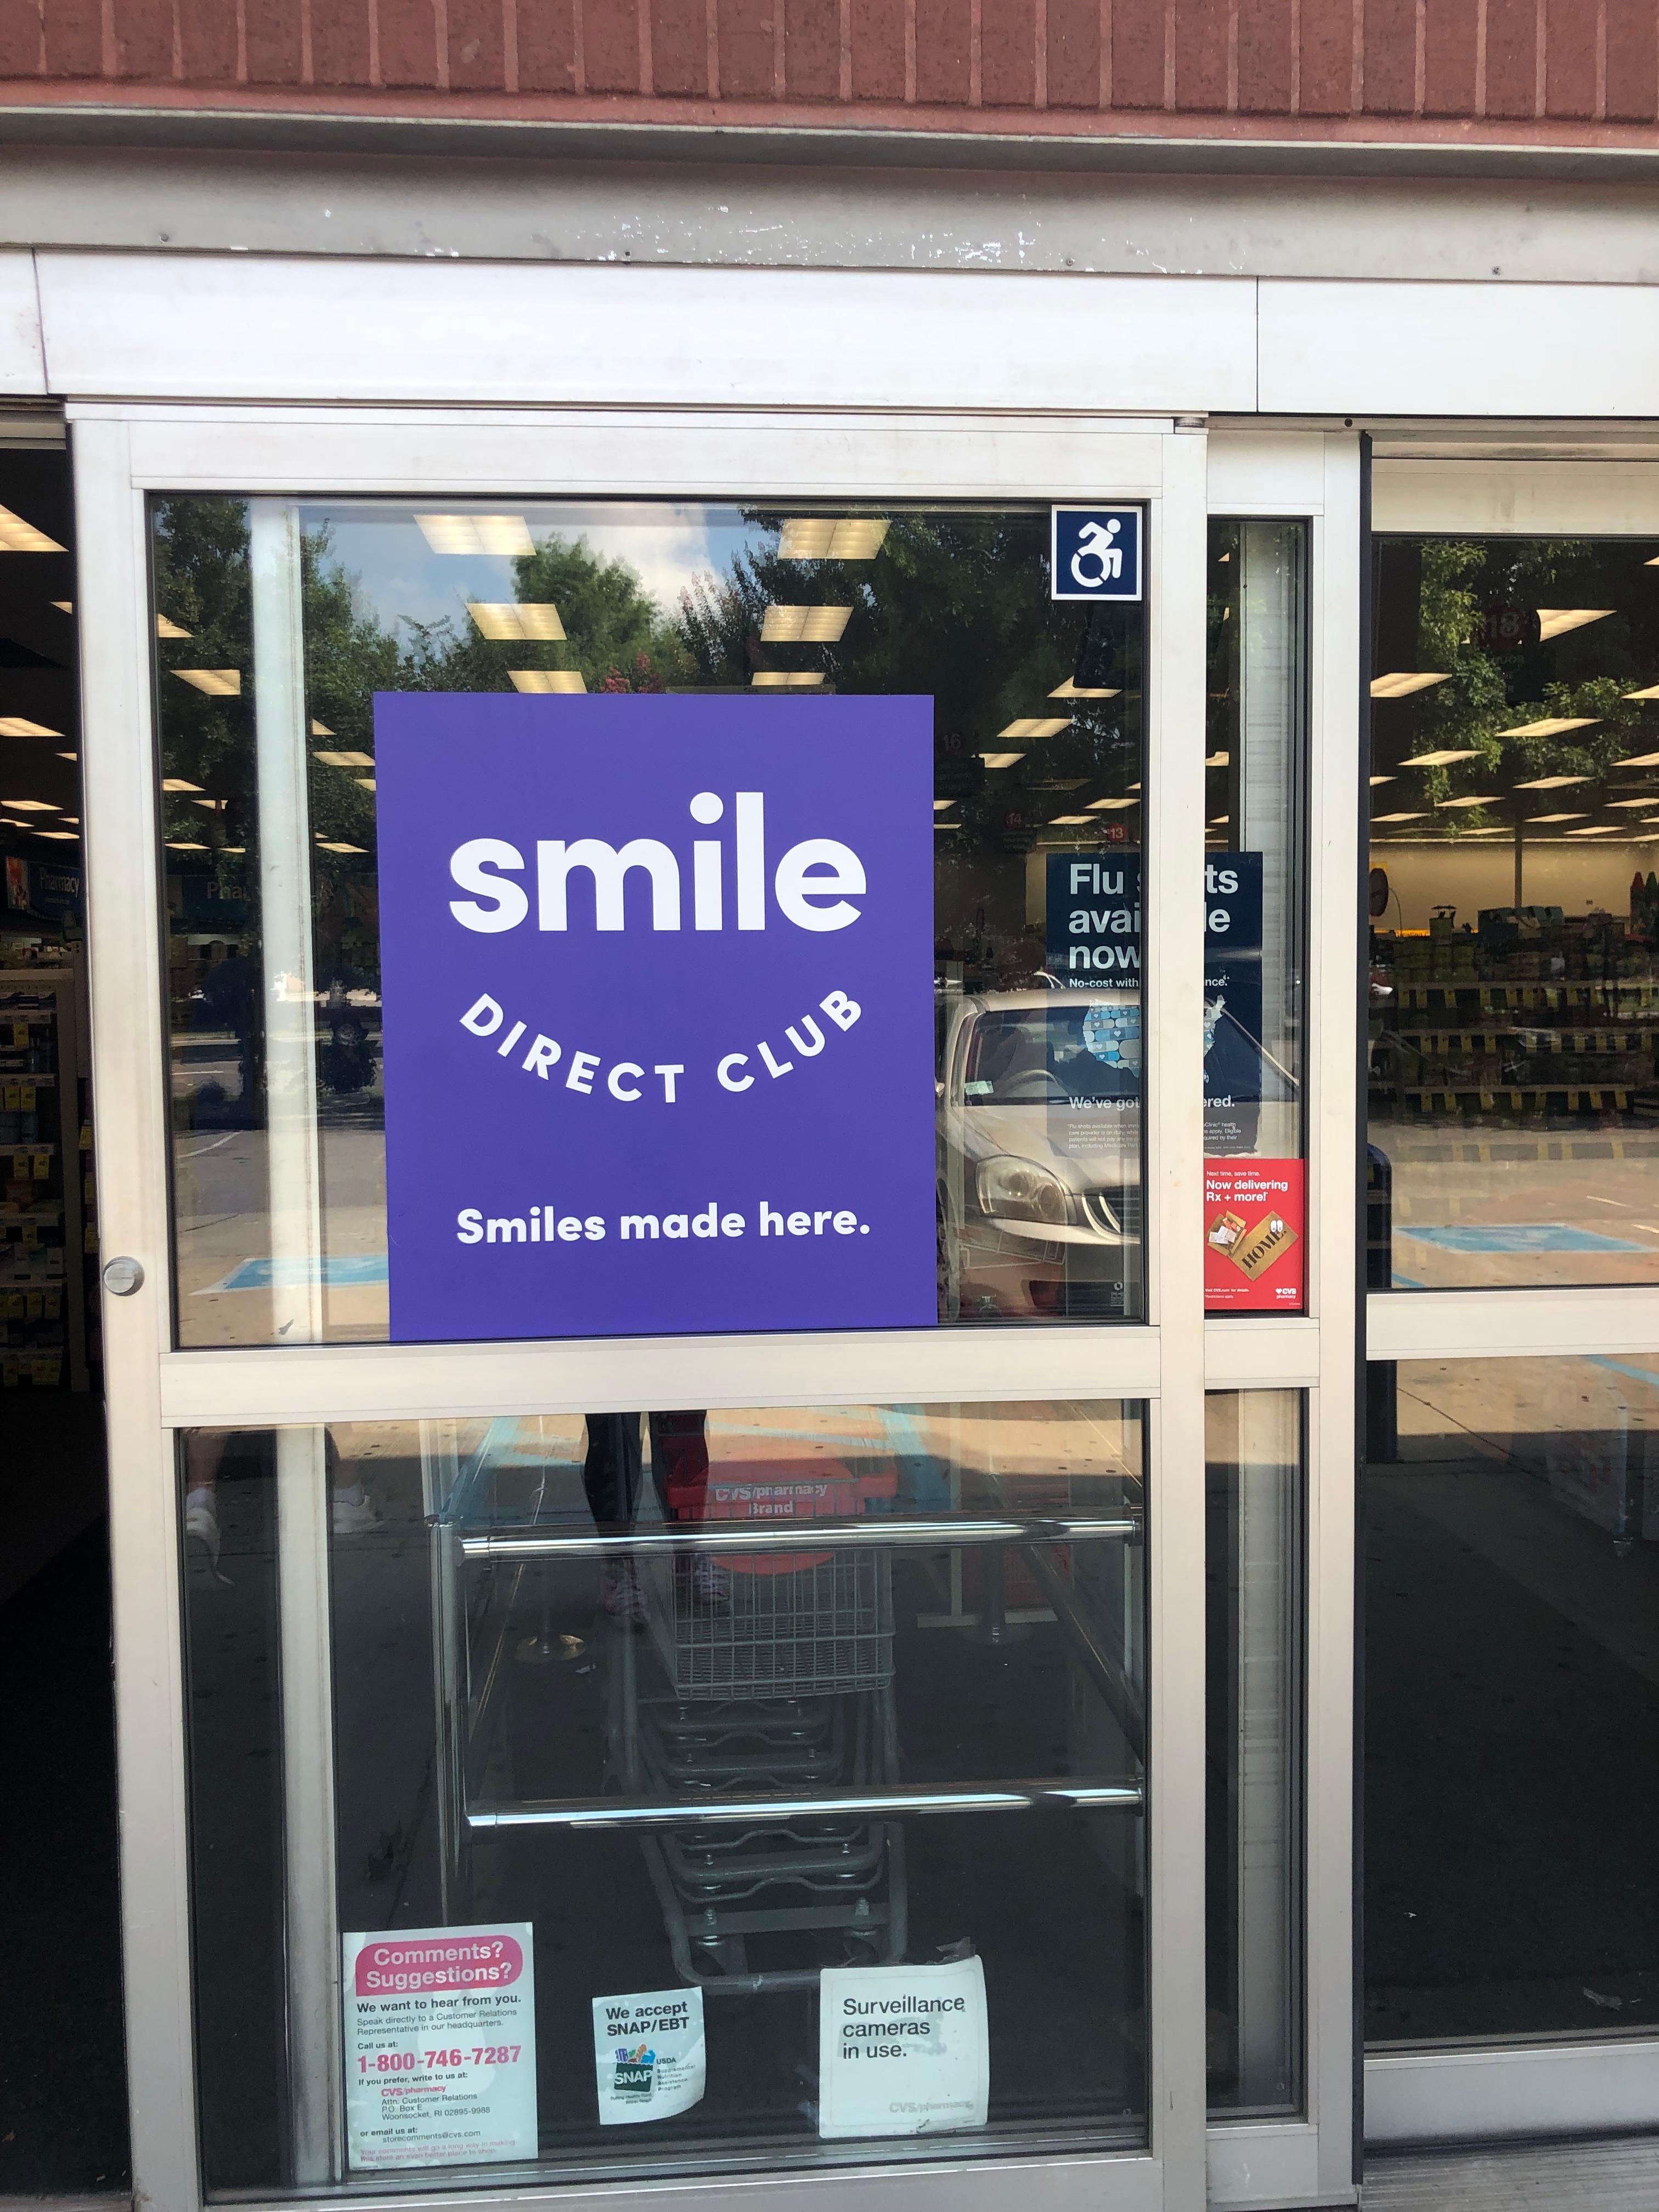 Smile Direct Club image 2